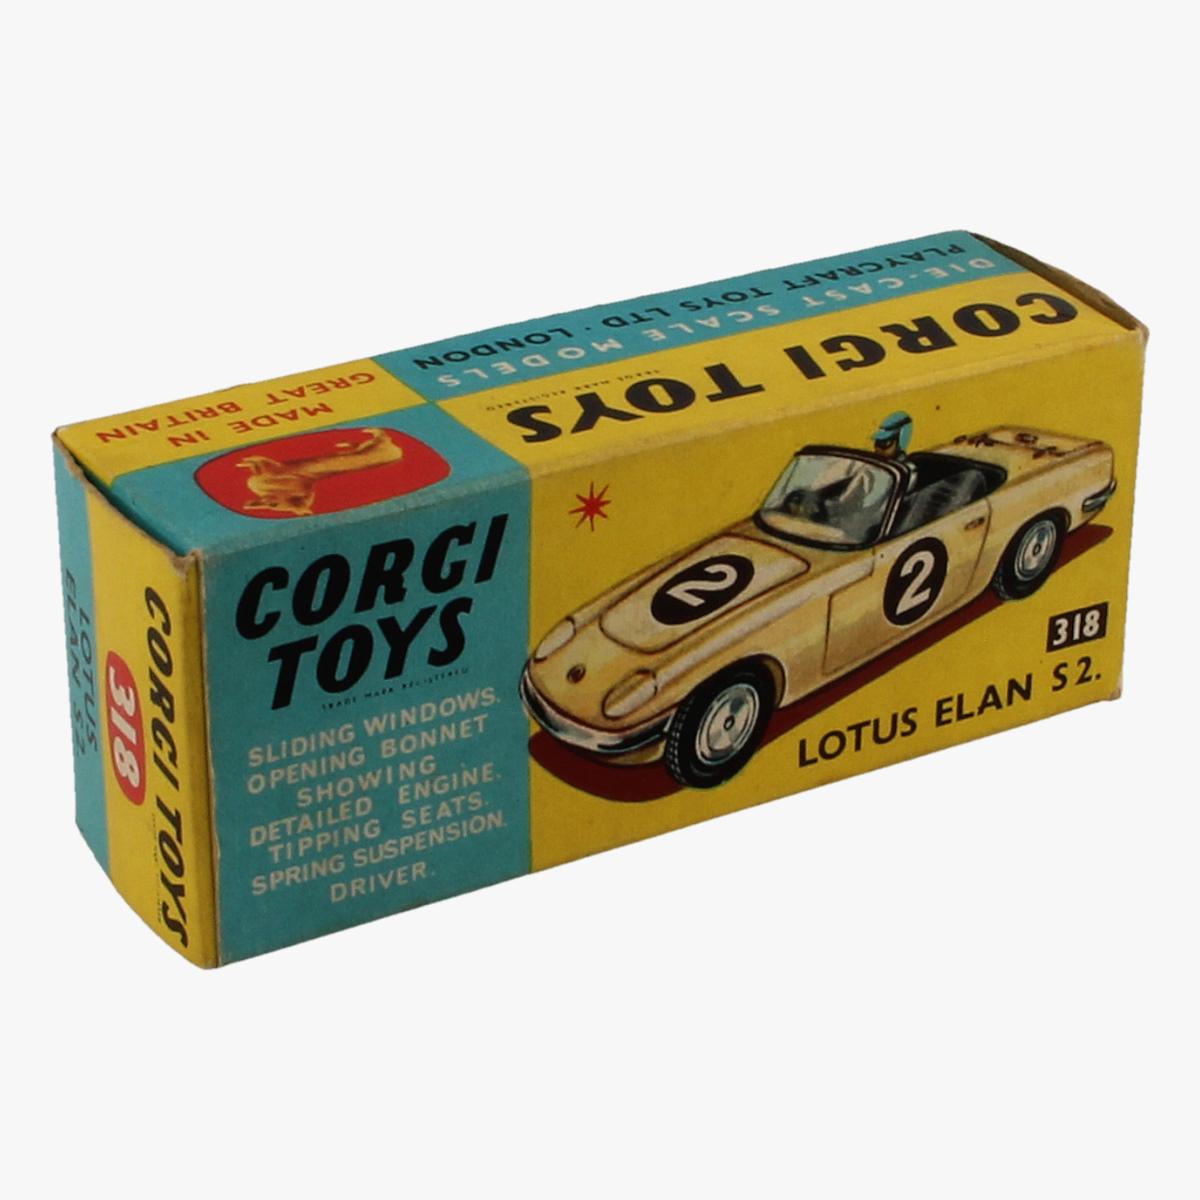 Afbeeldingen van Corgi Toys. Lotus Elan S2. Nr. 318